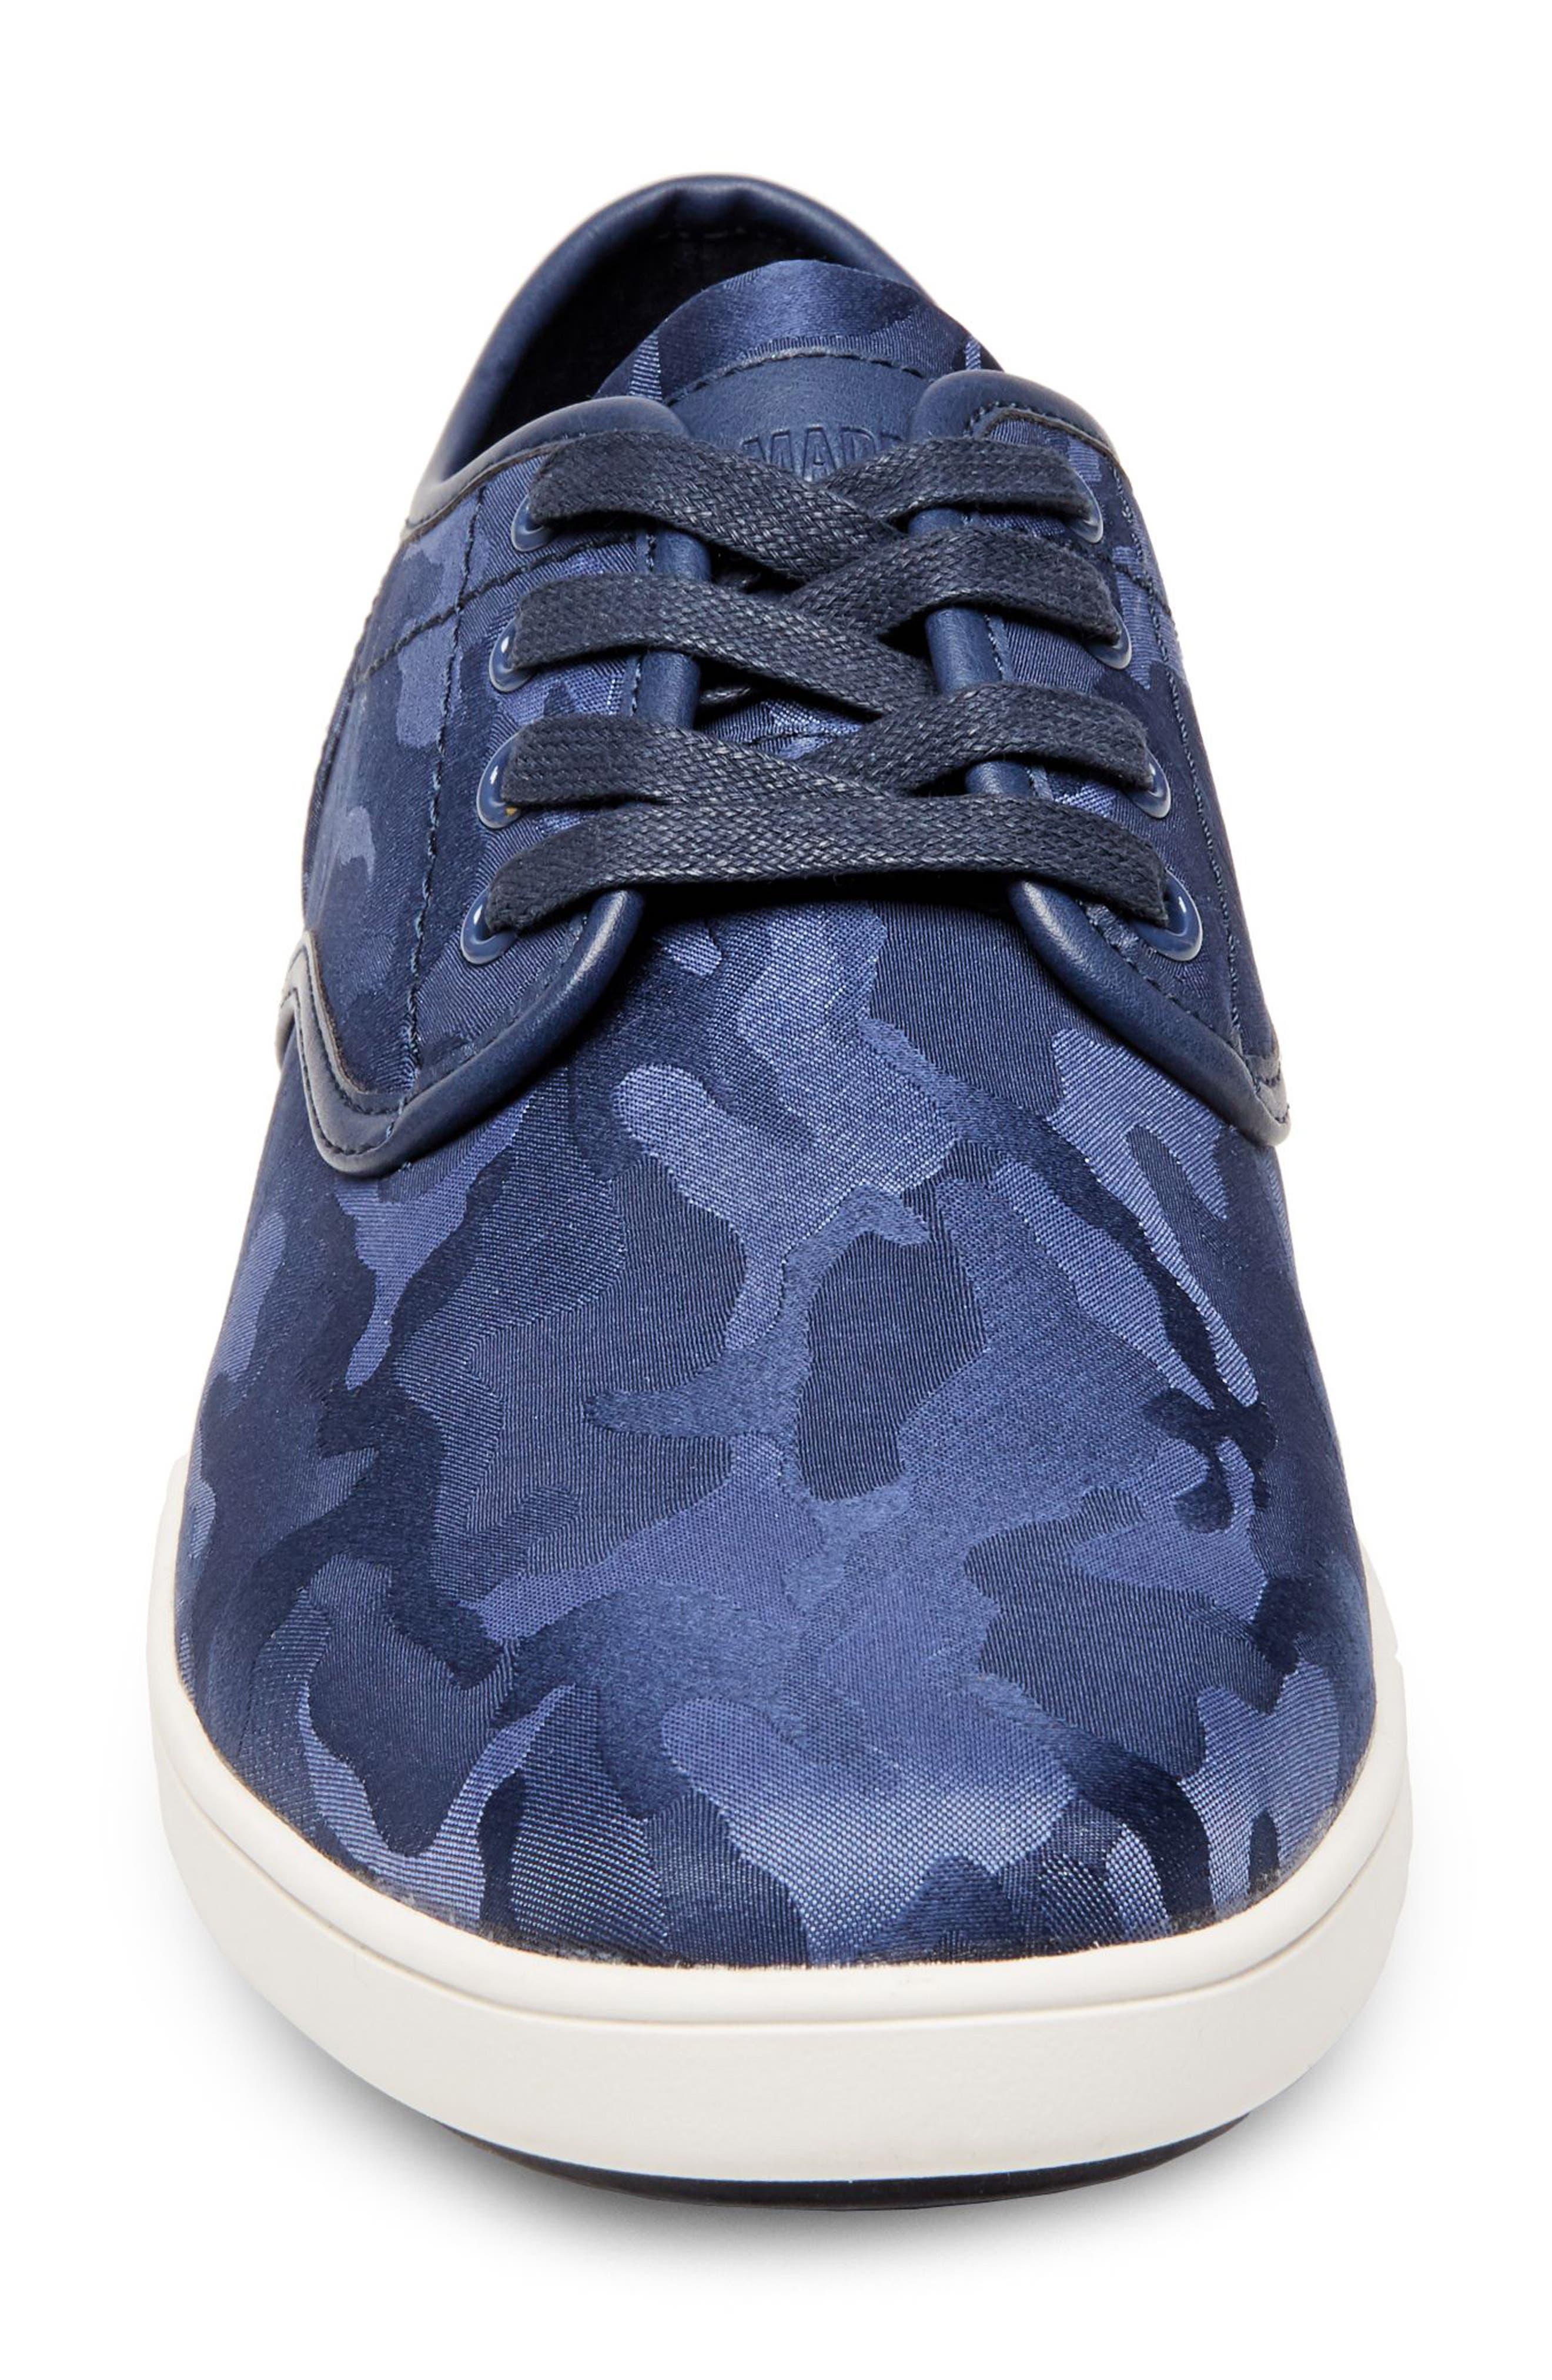 Frenzo Camo Sneaker,                             Alternate thumbnail 5, color,                             Blue Camo Fabric